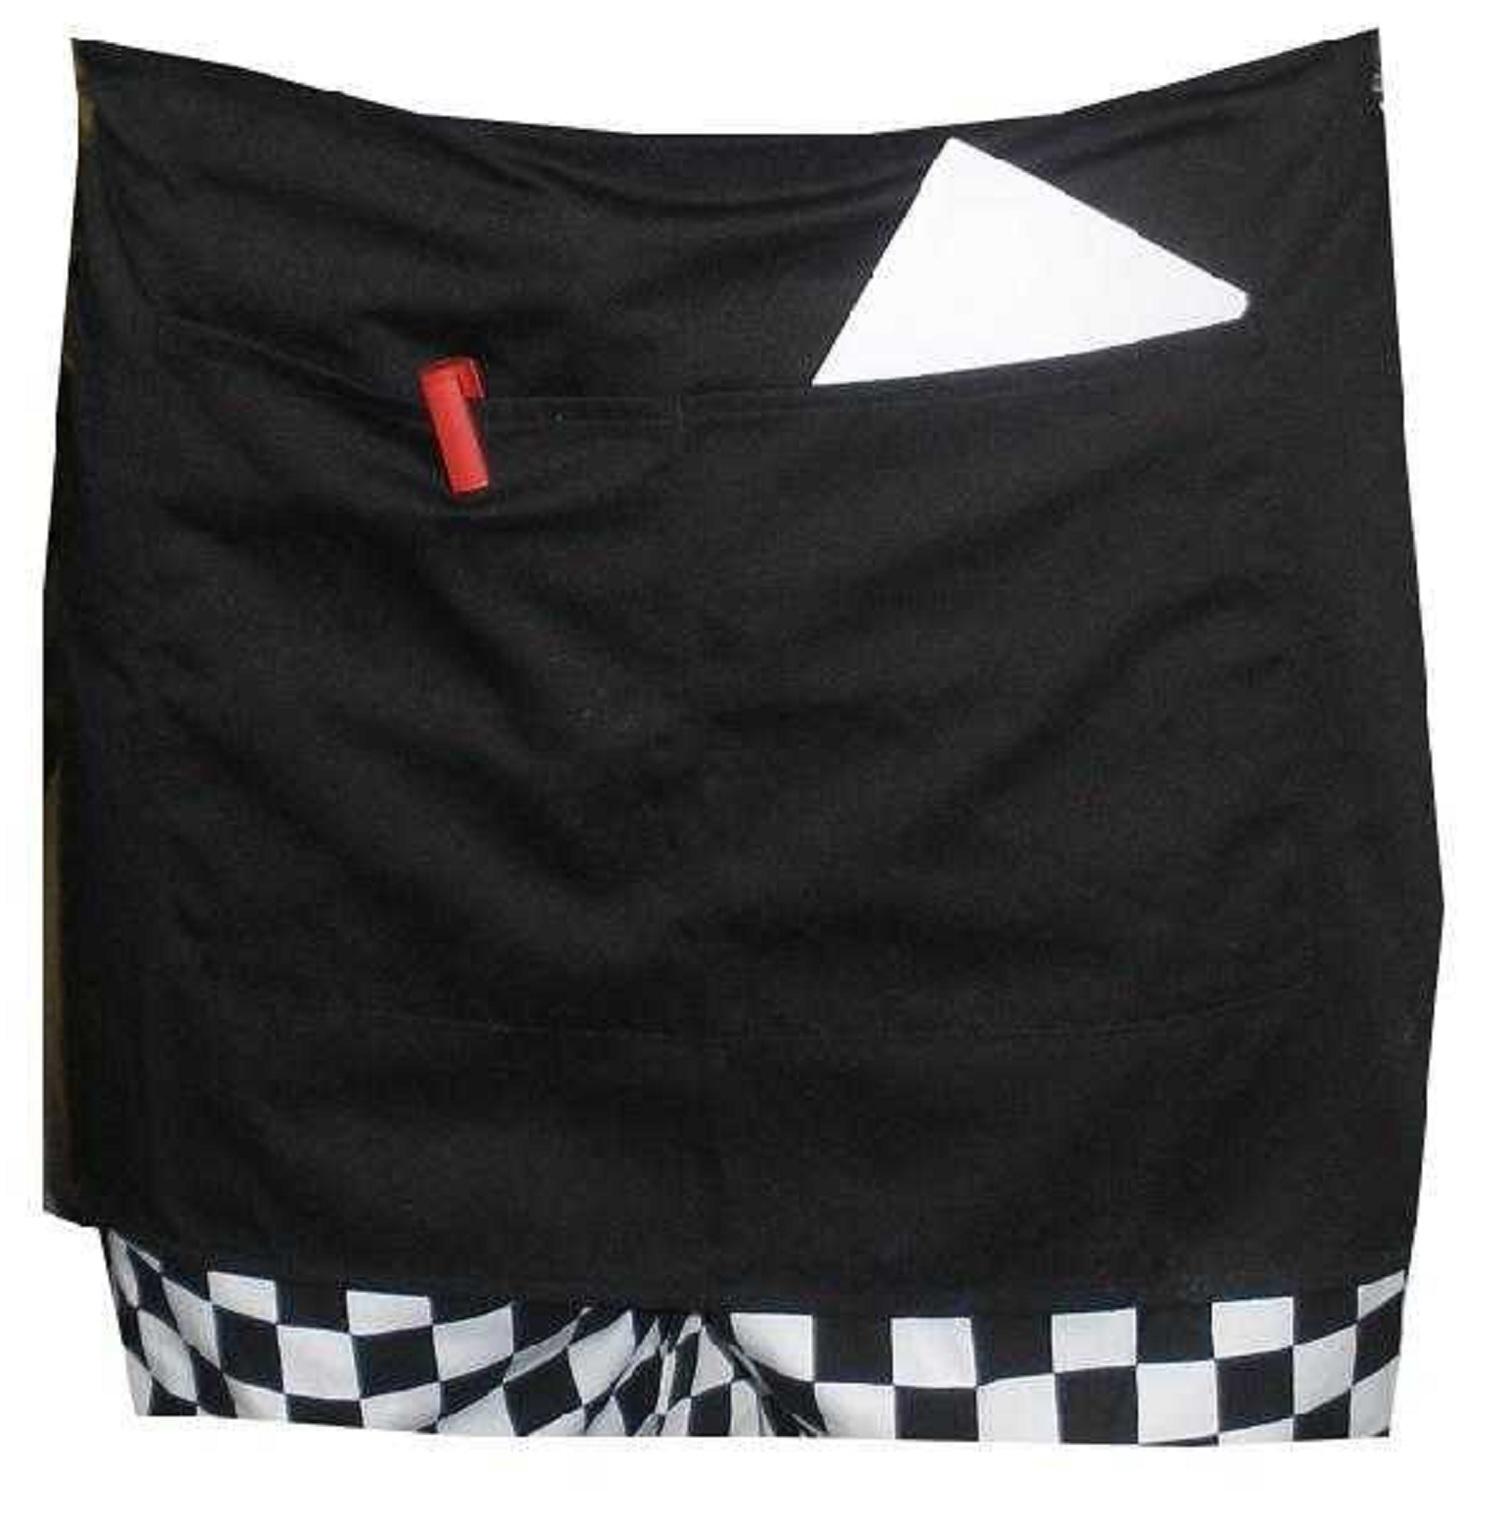 White half apron ebay - Black Short Waist Apron Waiter Waitress Server Pinny 27 5 X 14 Split Pocket